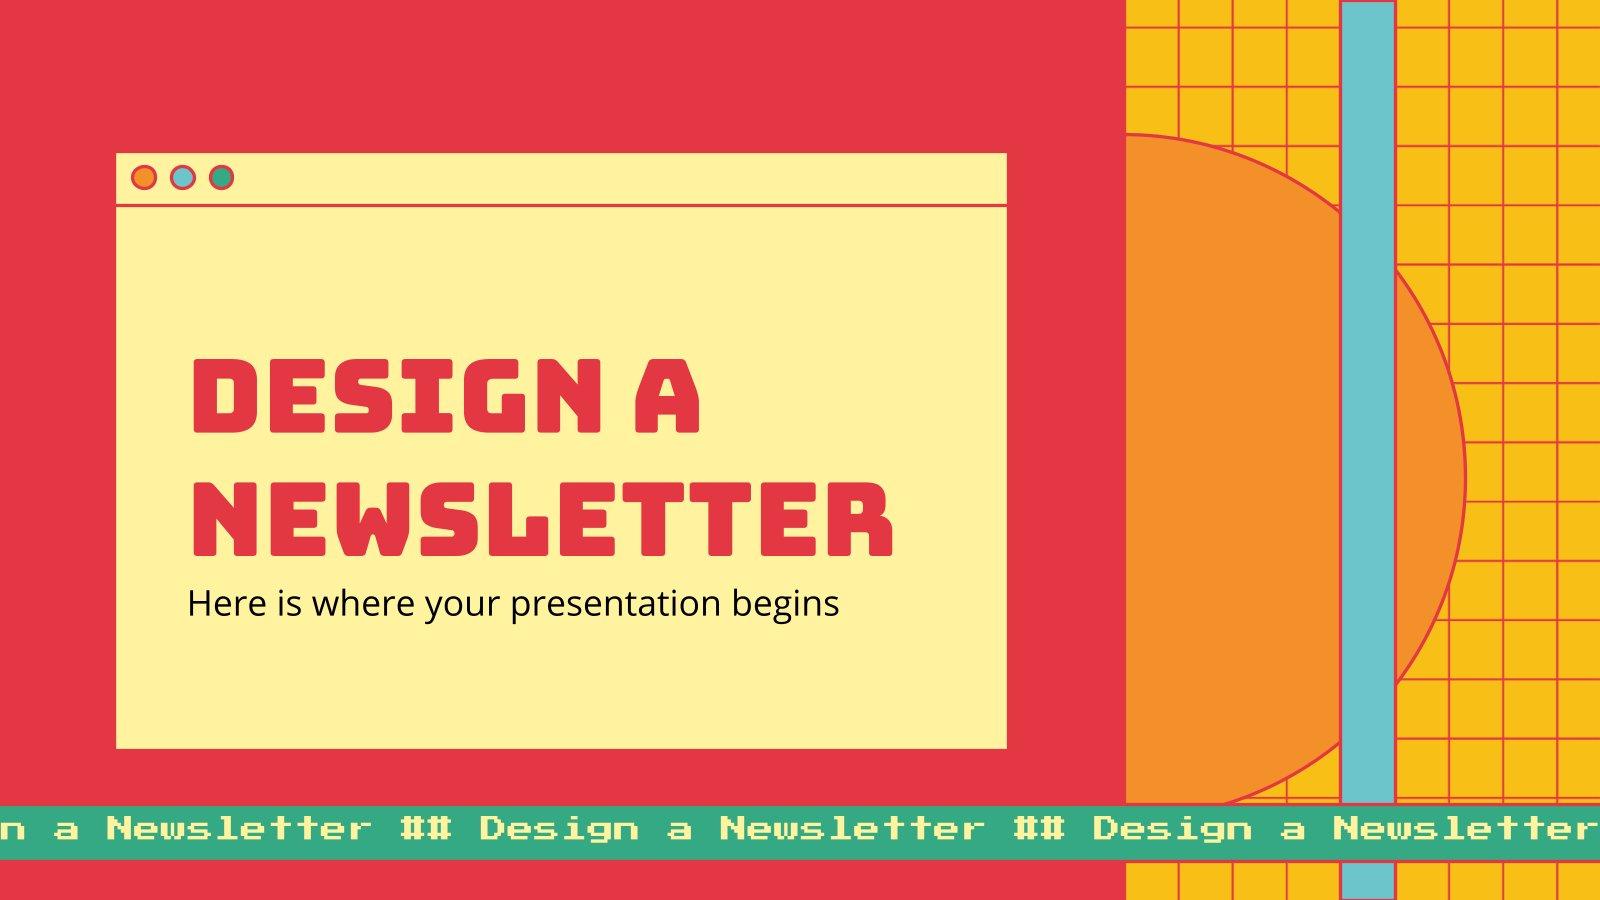 Design a Newsletter presentation template